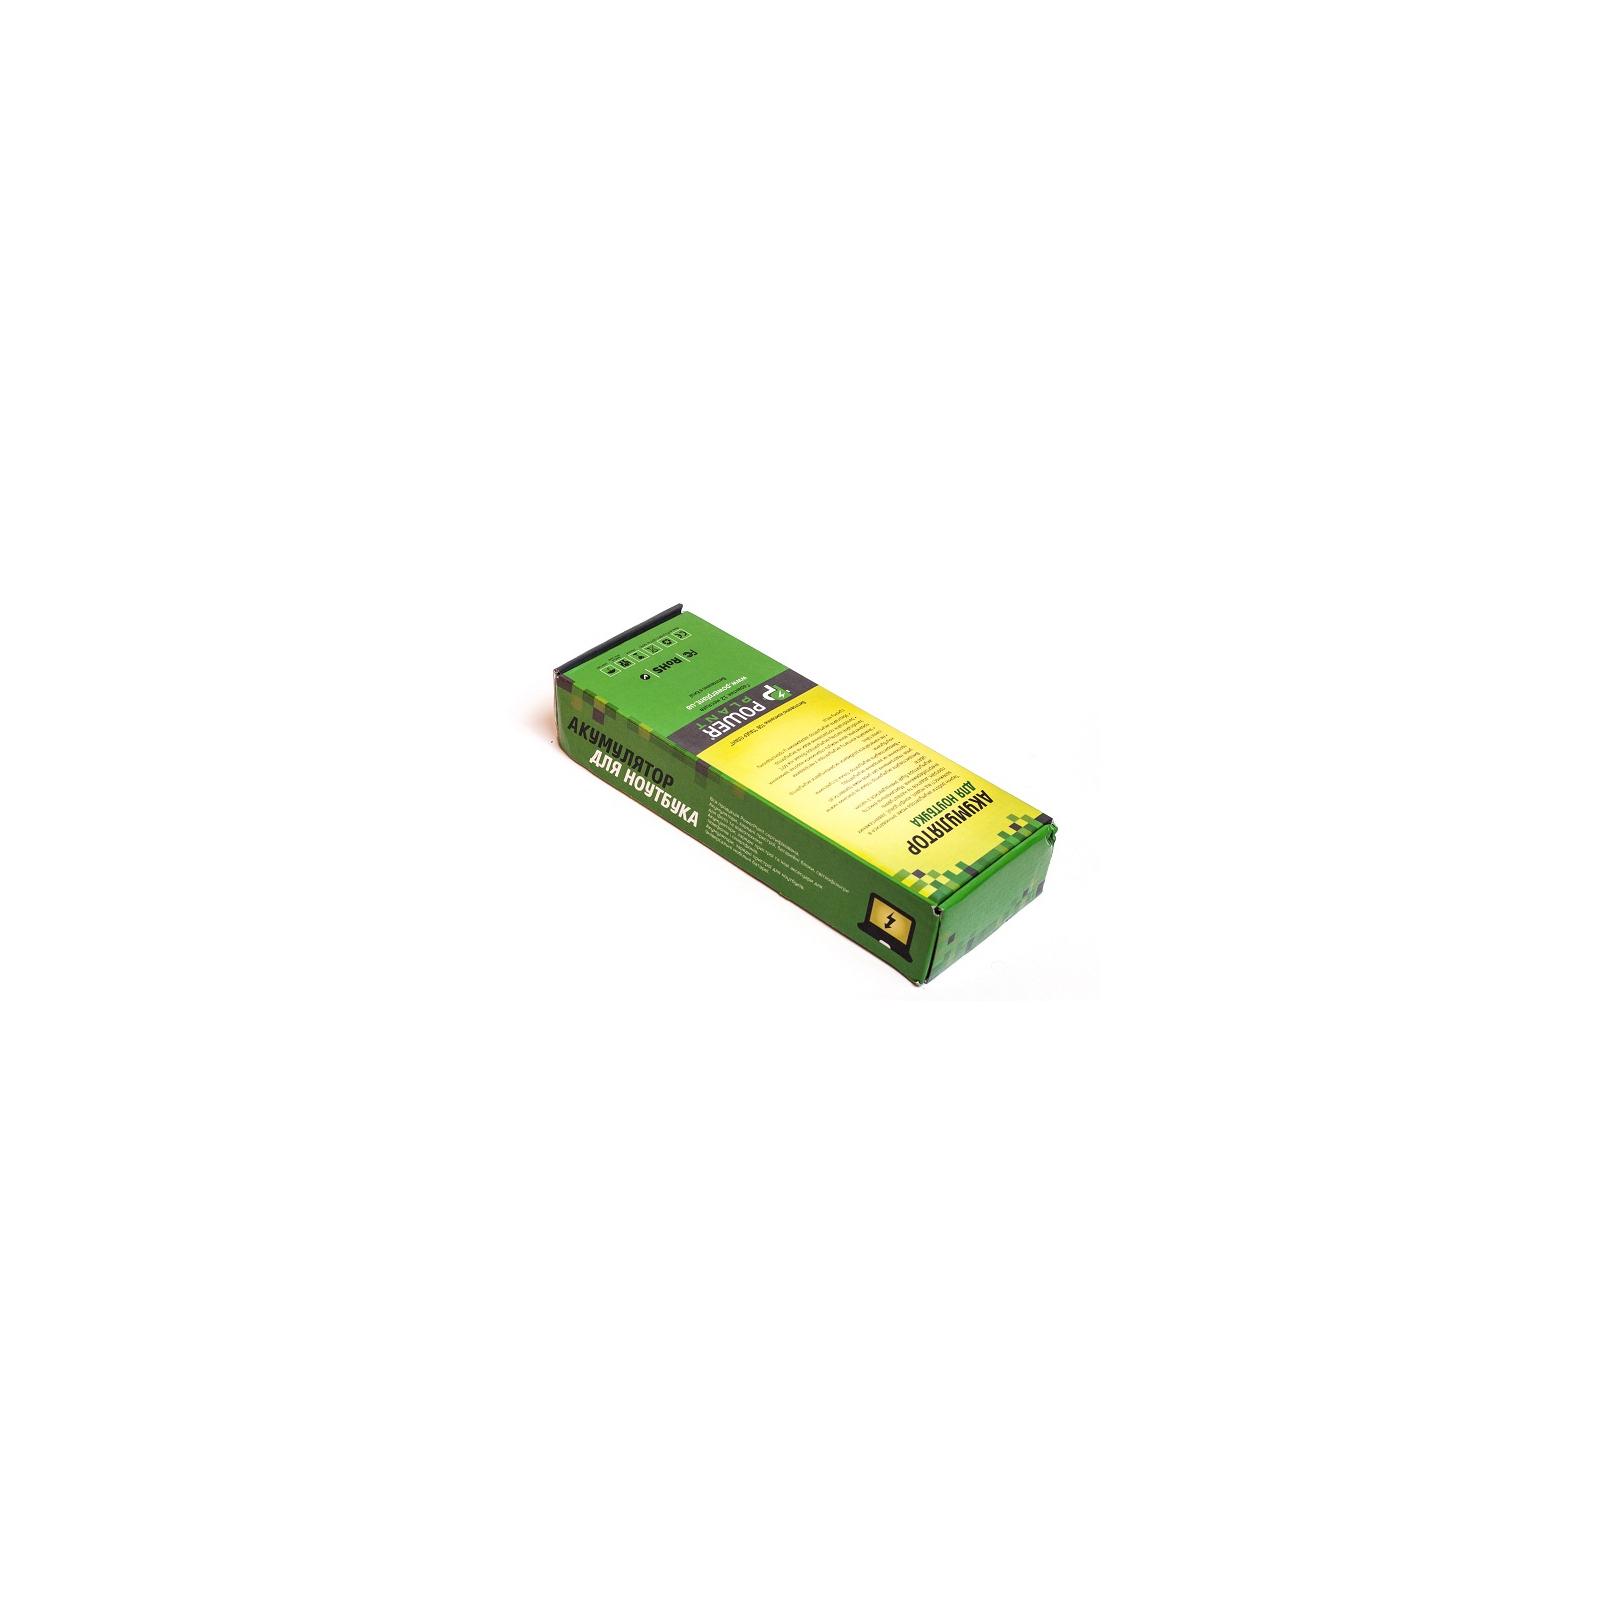 Аккумулятор для ноутбука HP NX7400 (HSTNN-DB11, H7404LH) 14.4V, 5200mAh PowerPlant (NB00000126) изображение 2